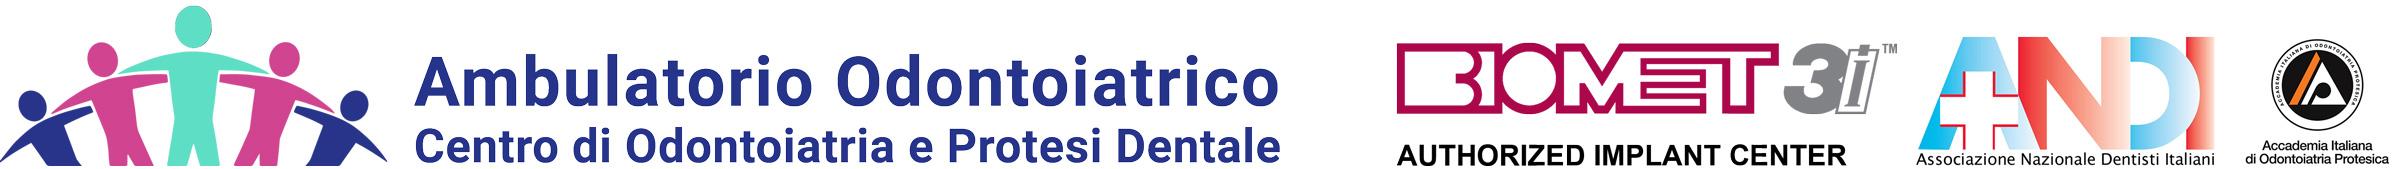 Ambulatorio Odontoiatrico Logo